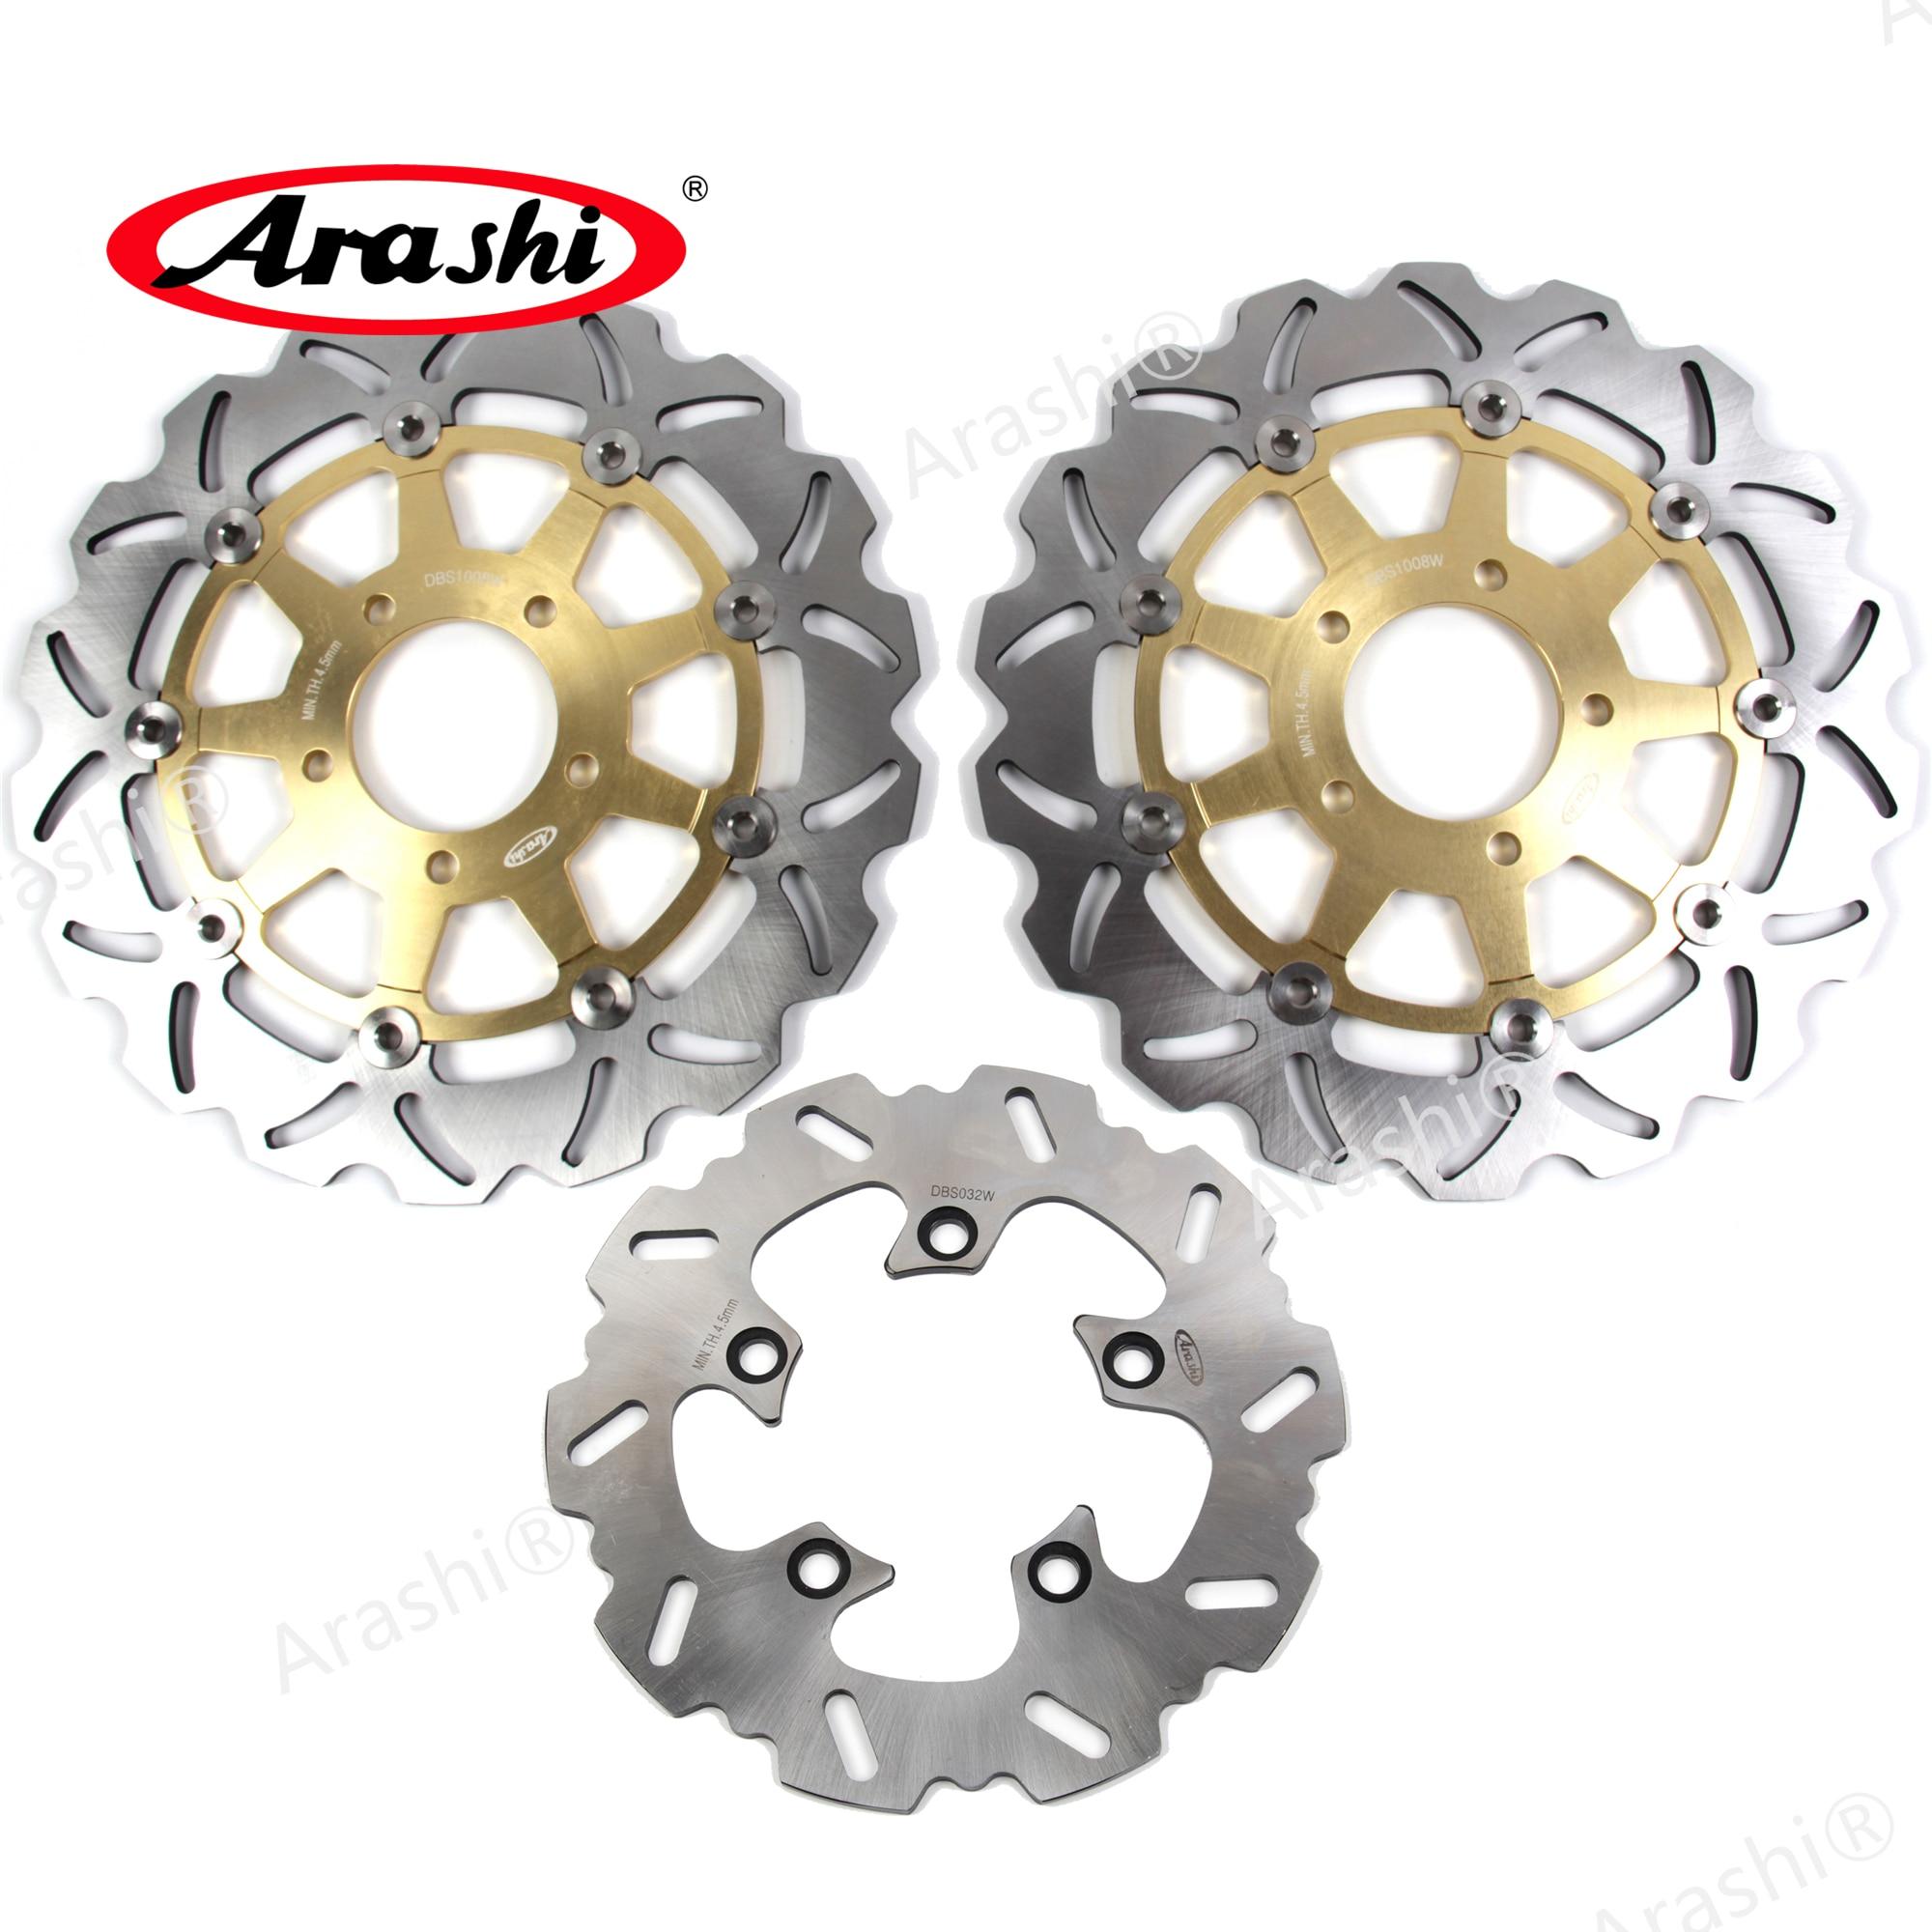 Ducati Disc Brake Pads 620 2003-2014 Front /& Rear 3 sets